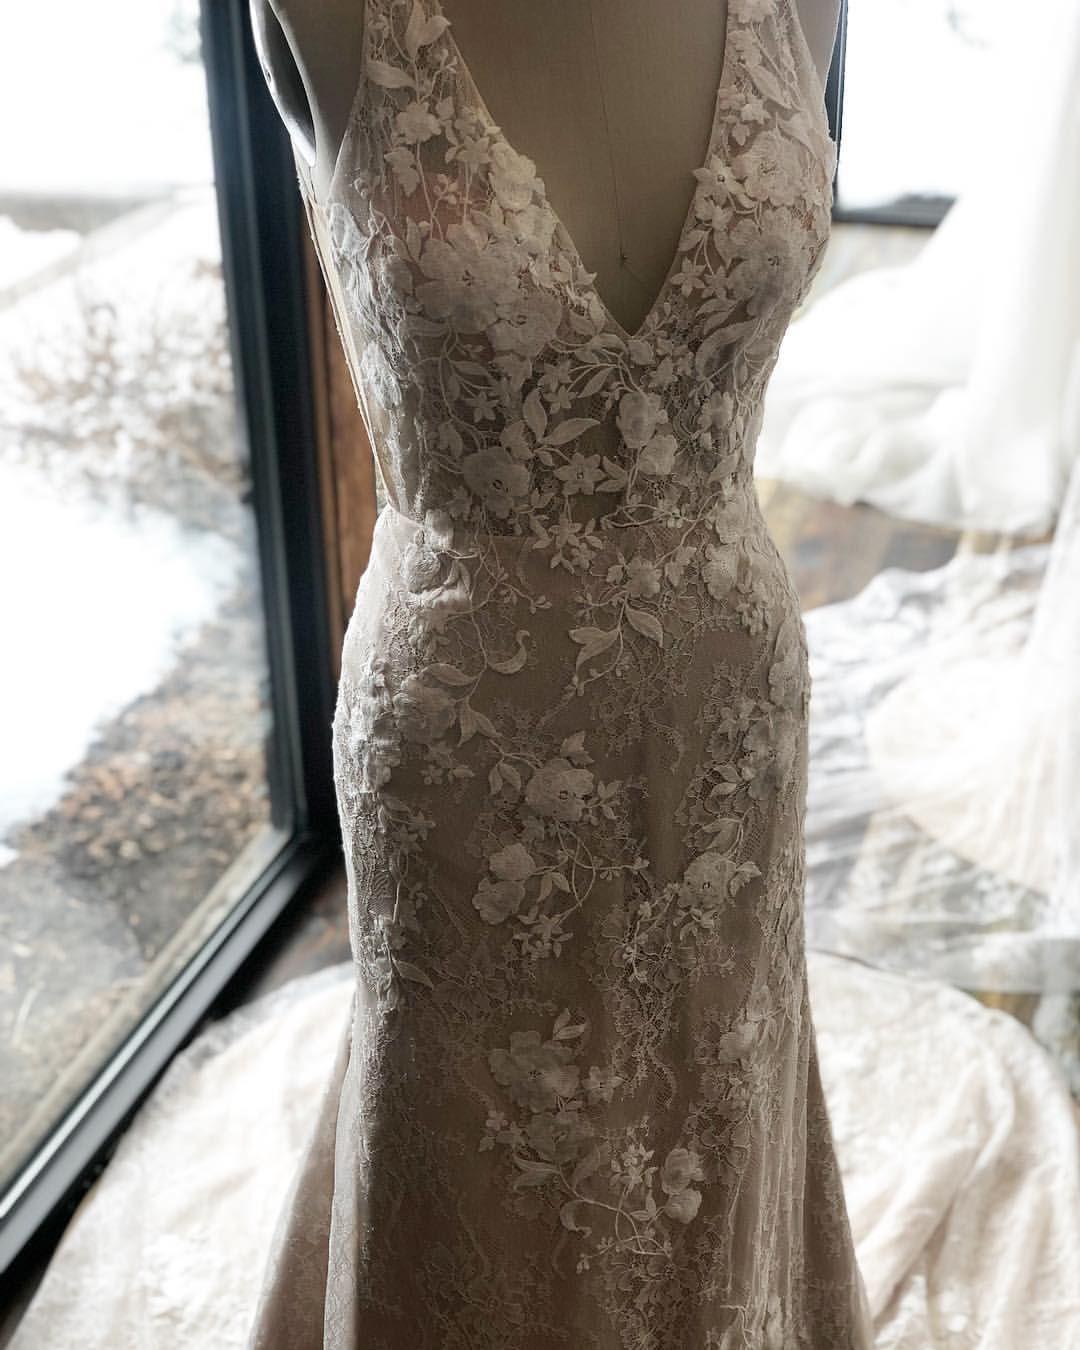 Pin By Ti Adora On Ti Adora Spring 2019 Collection Wedding Dresses Lace Wedding Dresses Bridal [ 1350 x 1080 Pixel ]